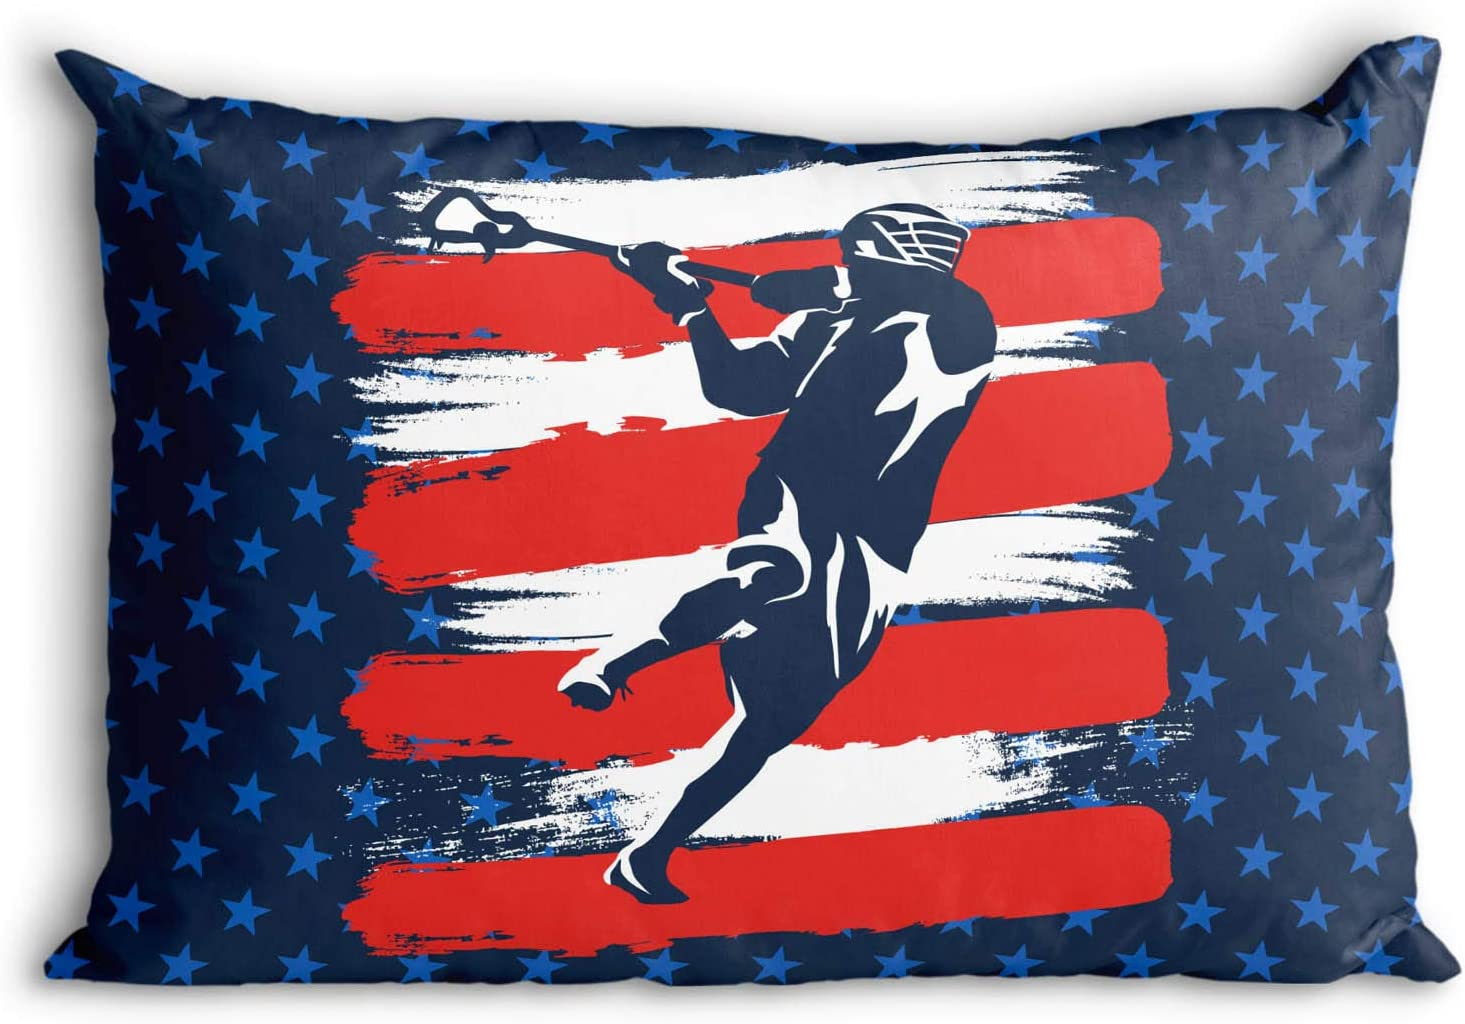 USA Laxer Pillowcase   Guys Lacrosse Pillows by ChalkTalk Sports